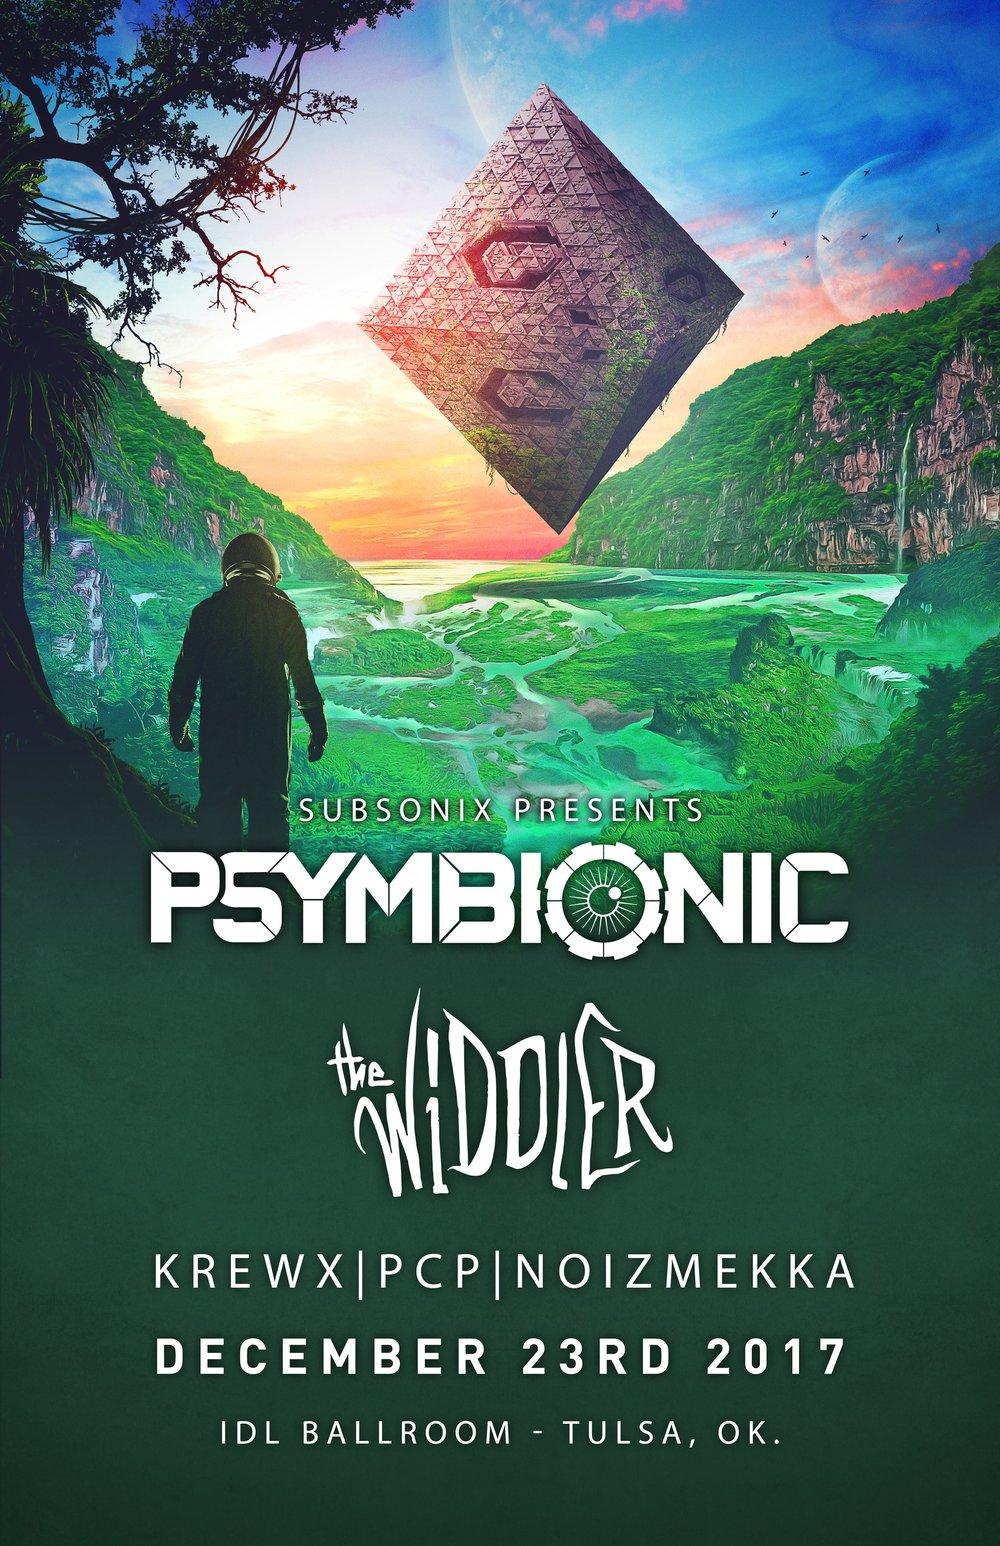 subsonix-psymbionic-the-widdler-tulsa-oklahoma.jpg